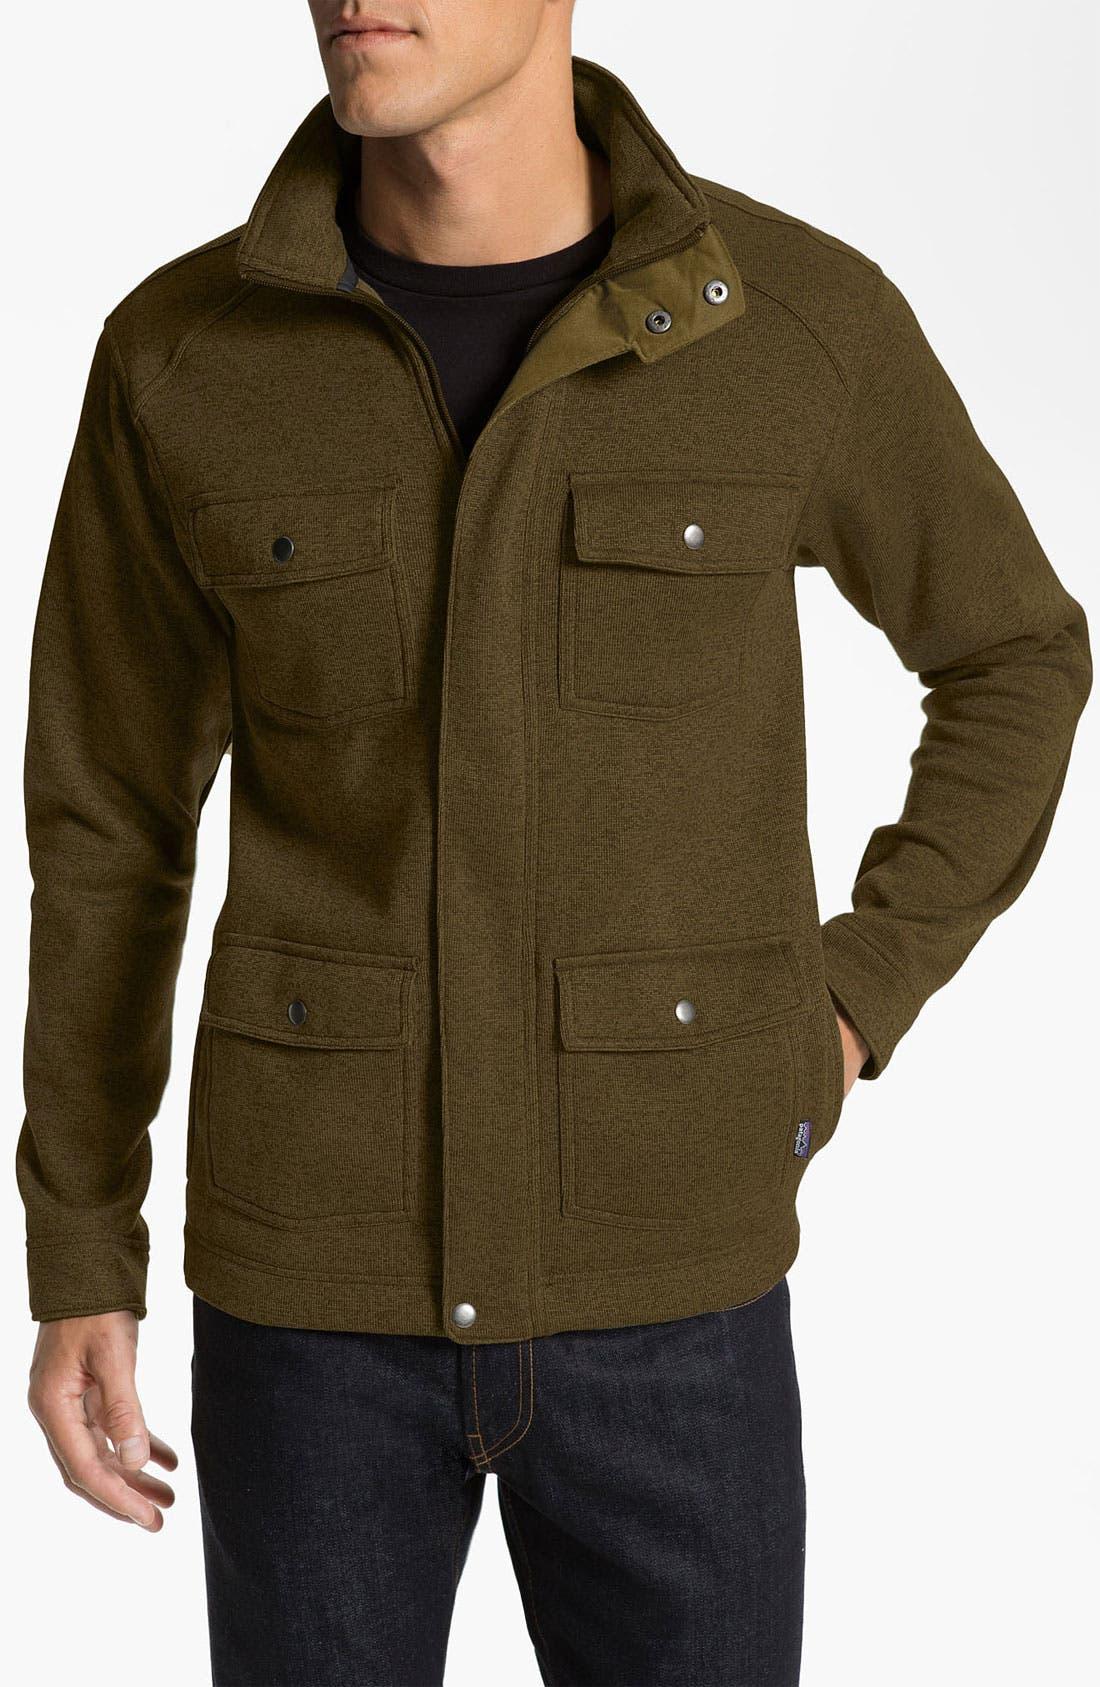 Main Image - Patagonia 'Better' Jacket